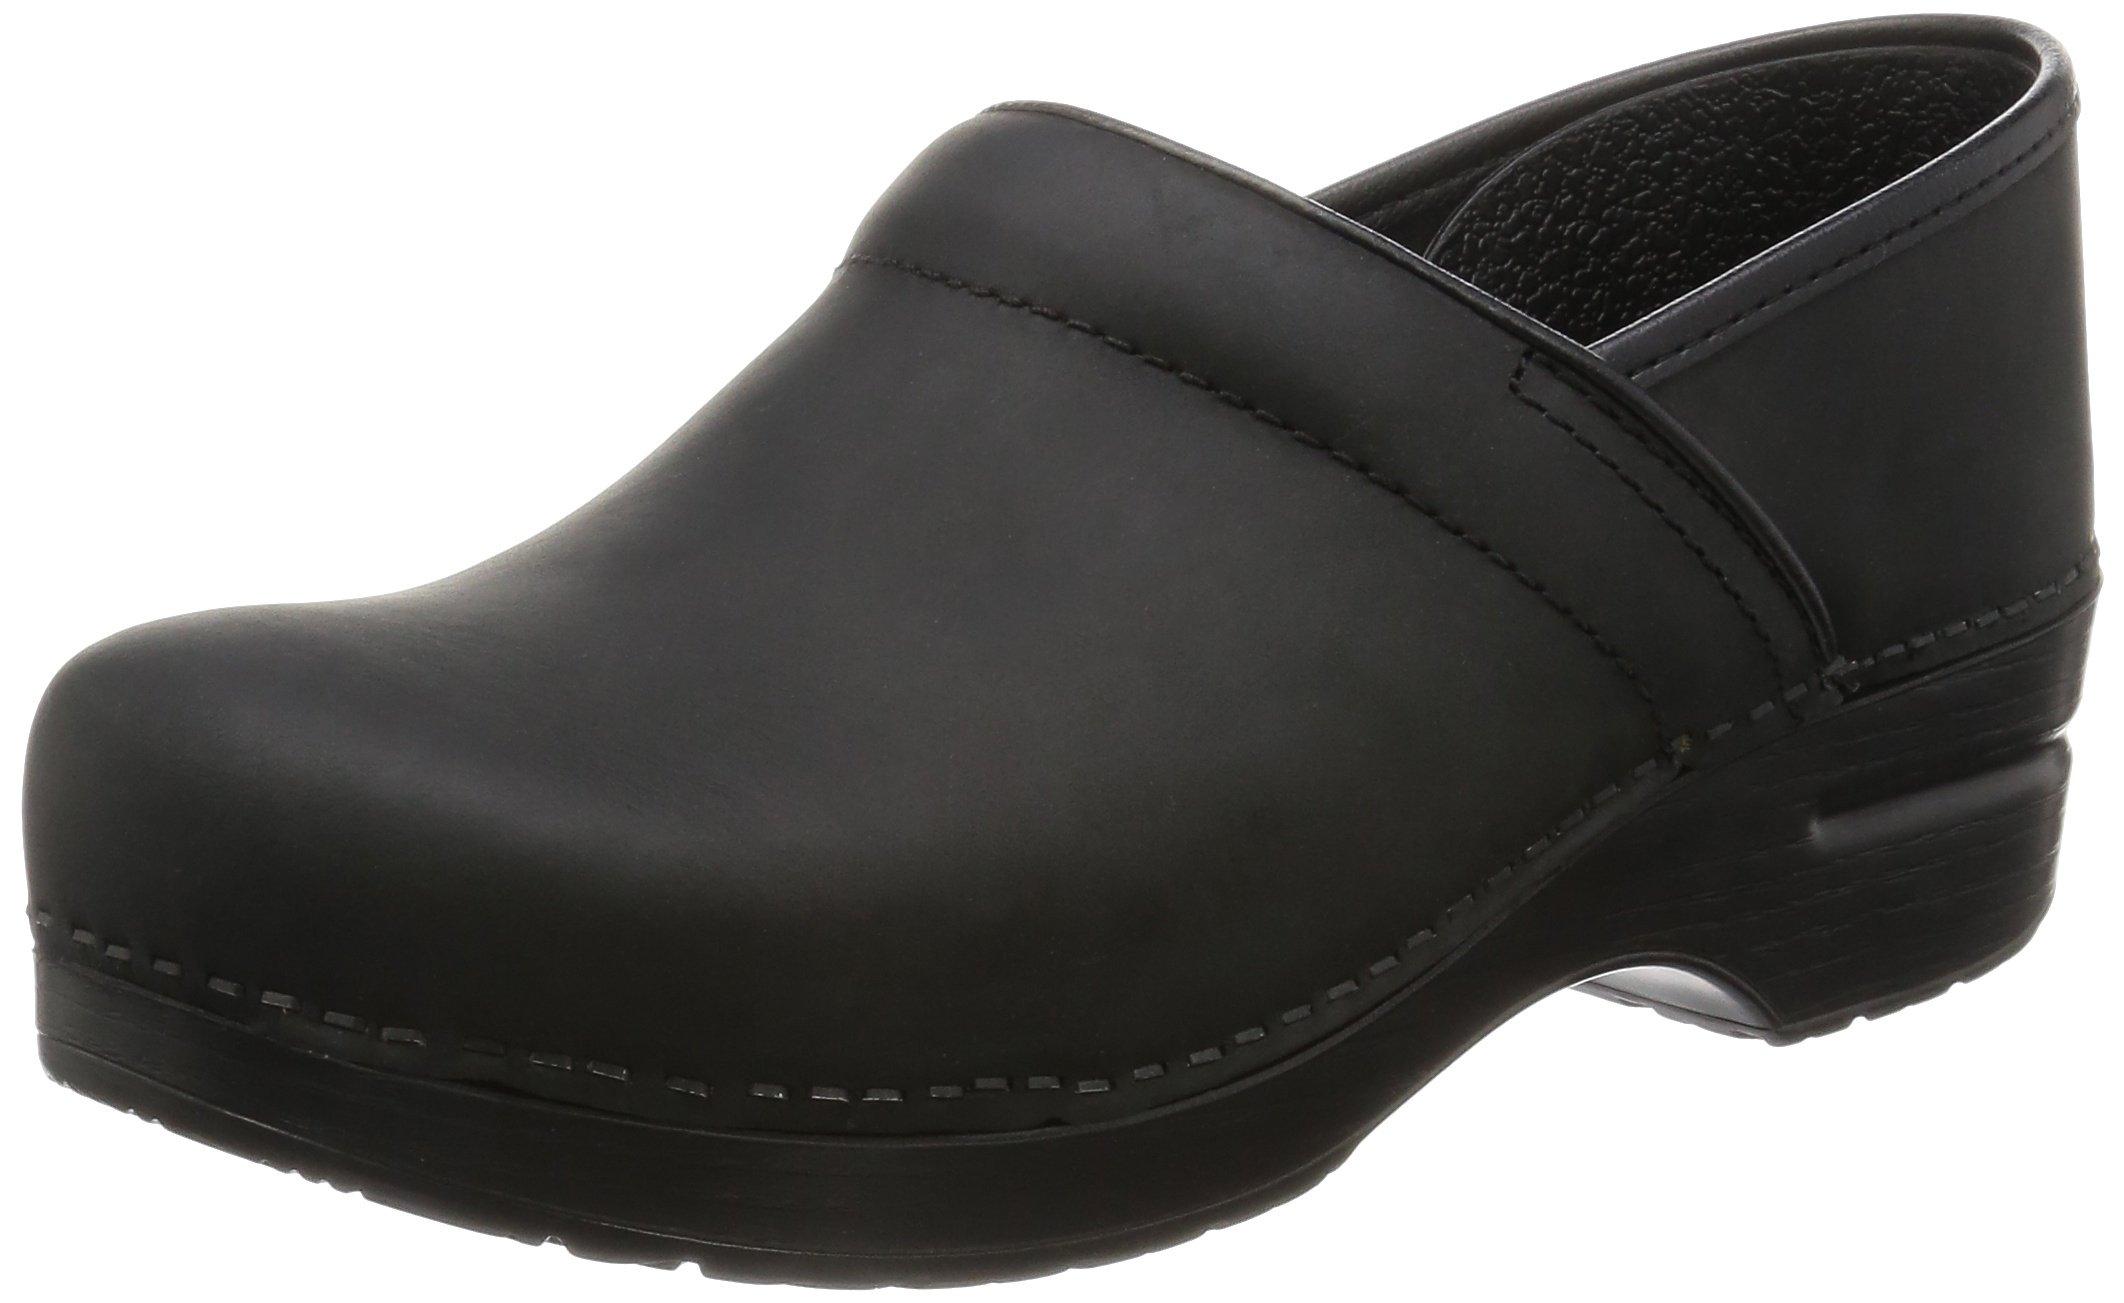 Dansko Women's Professional Shoe, black oiled, 39 M EU (8.5-9 US)